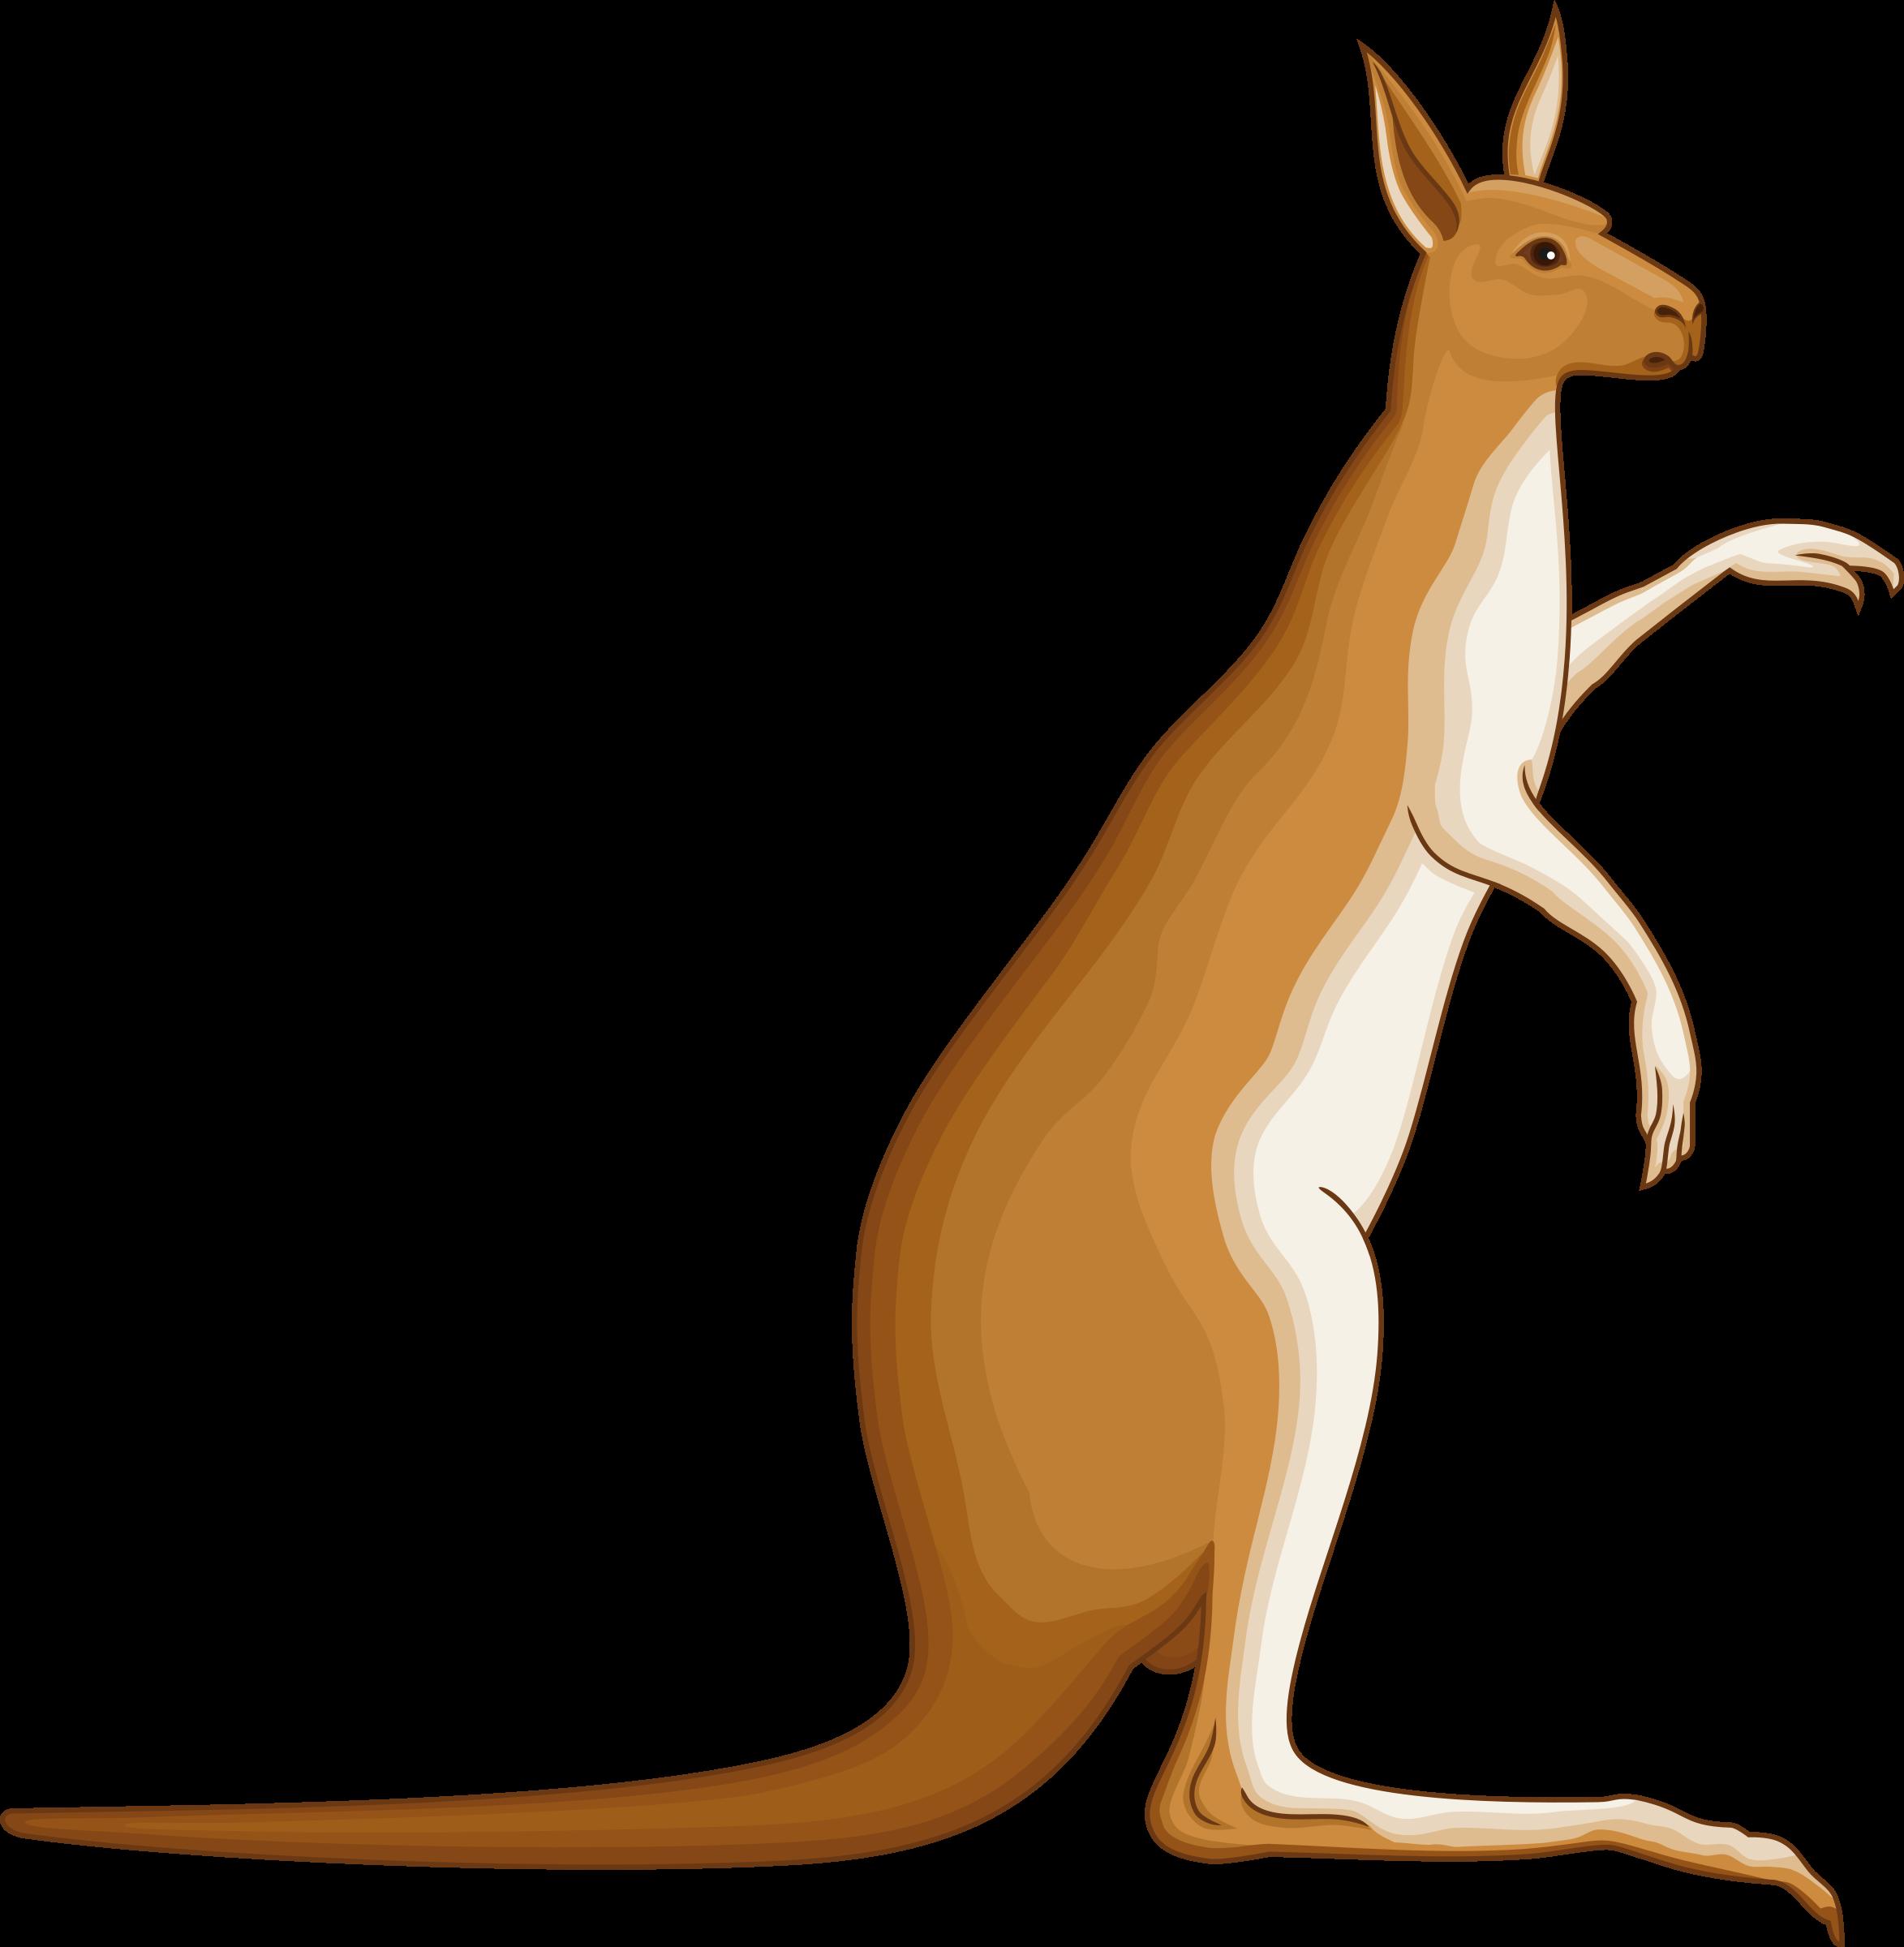 Big image png. Kangaroo clipart mammal